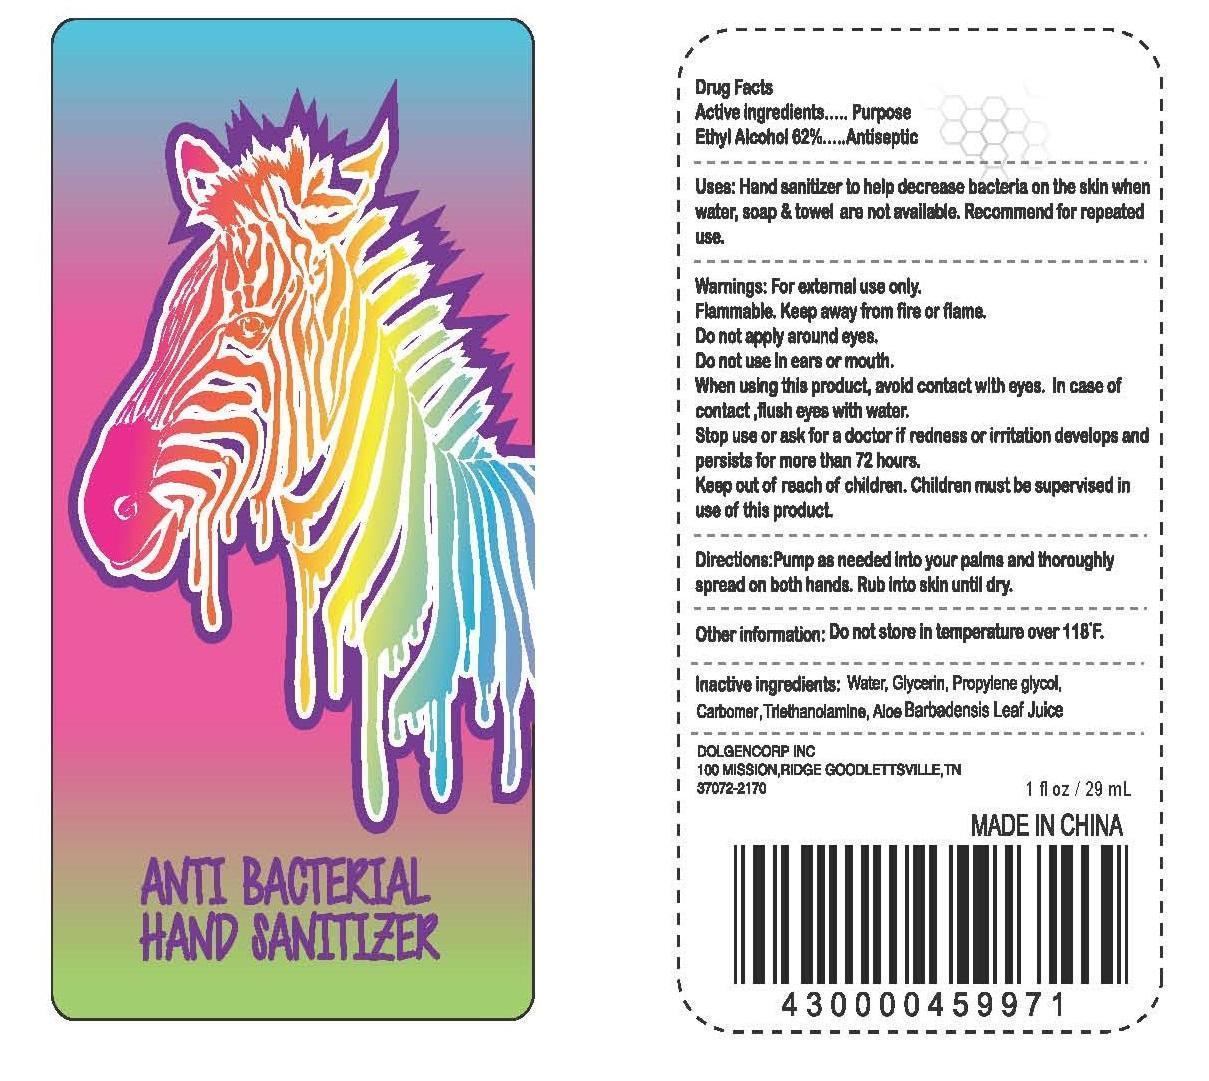 Anti Bacterial Hand Sanitizer (Ethyl Alcohol) Gel [Dolgencorp Inc]